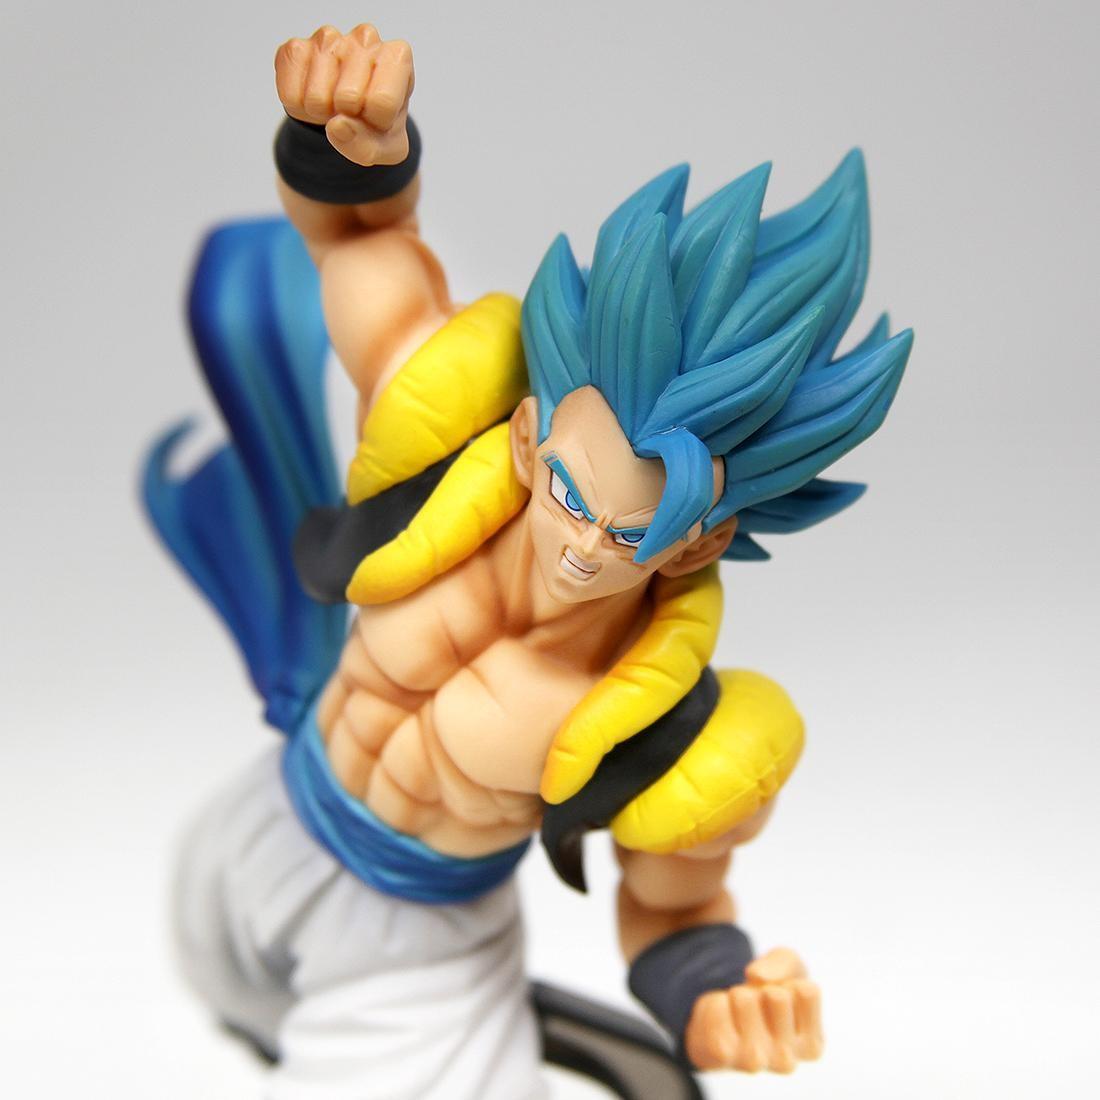 Banpresto The Movie Dragon Ball Super Broly SCultures The TAG Team Super Saiyan God Super Saiyan Gogeta Z-Battle Figure